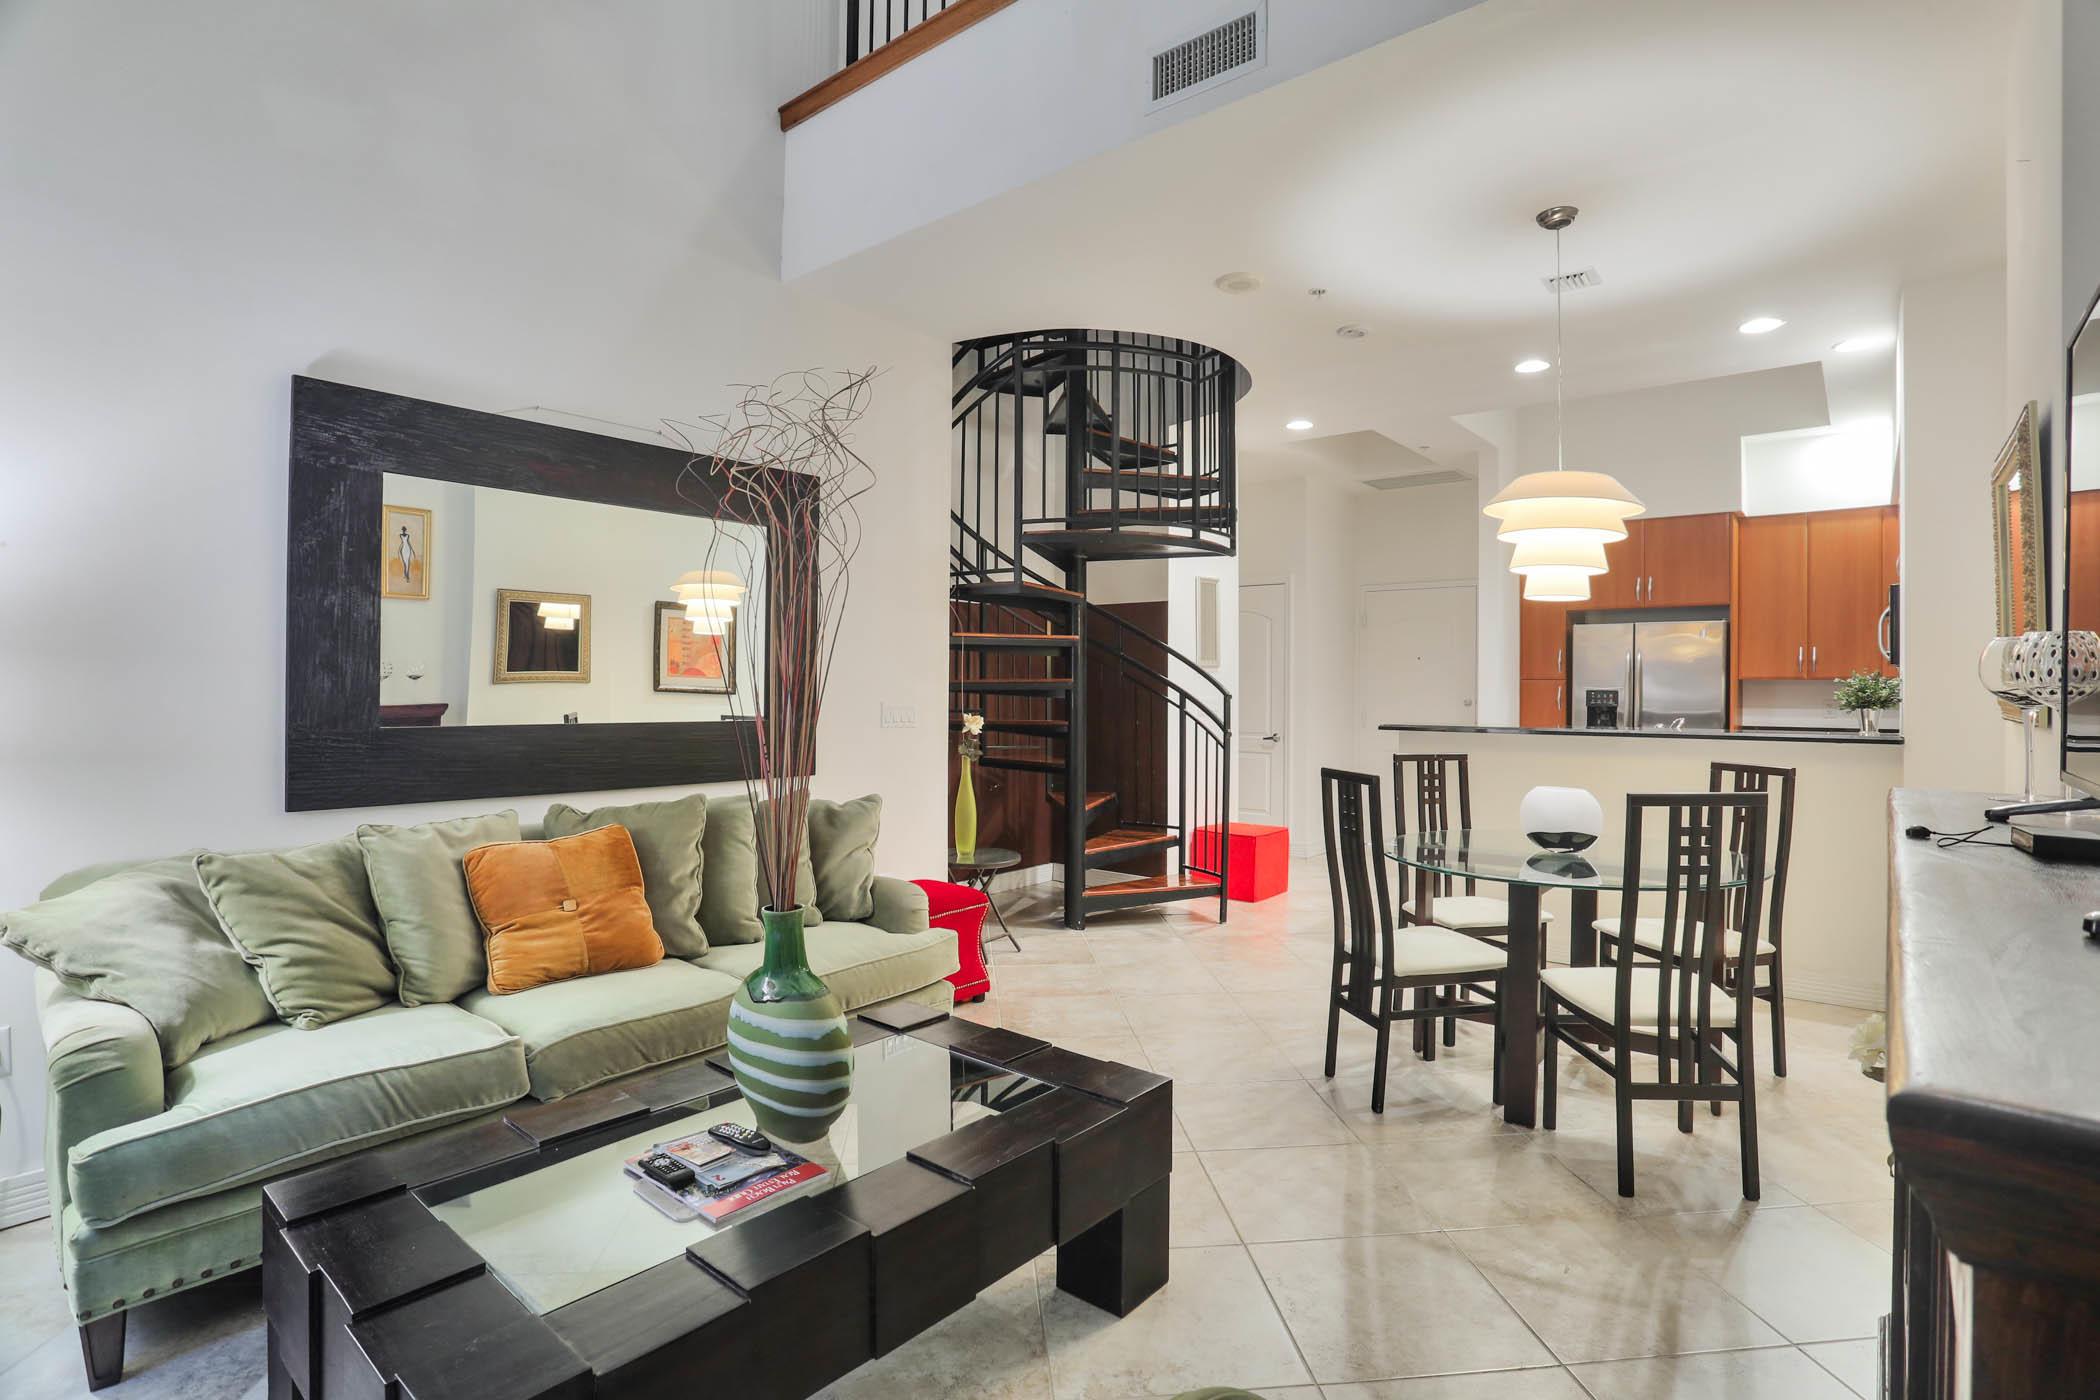 801 S Olive Avenue 229 West Palm Beach, FL 33401